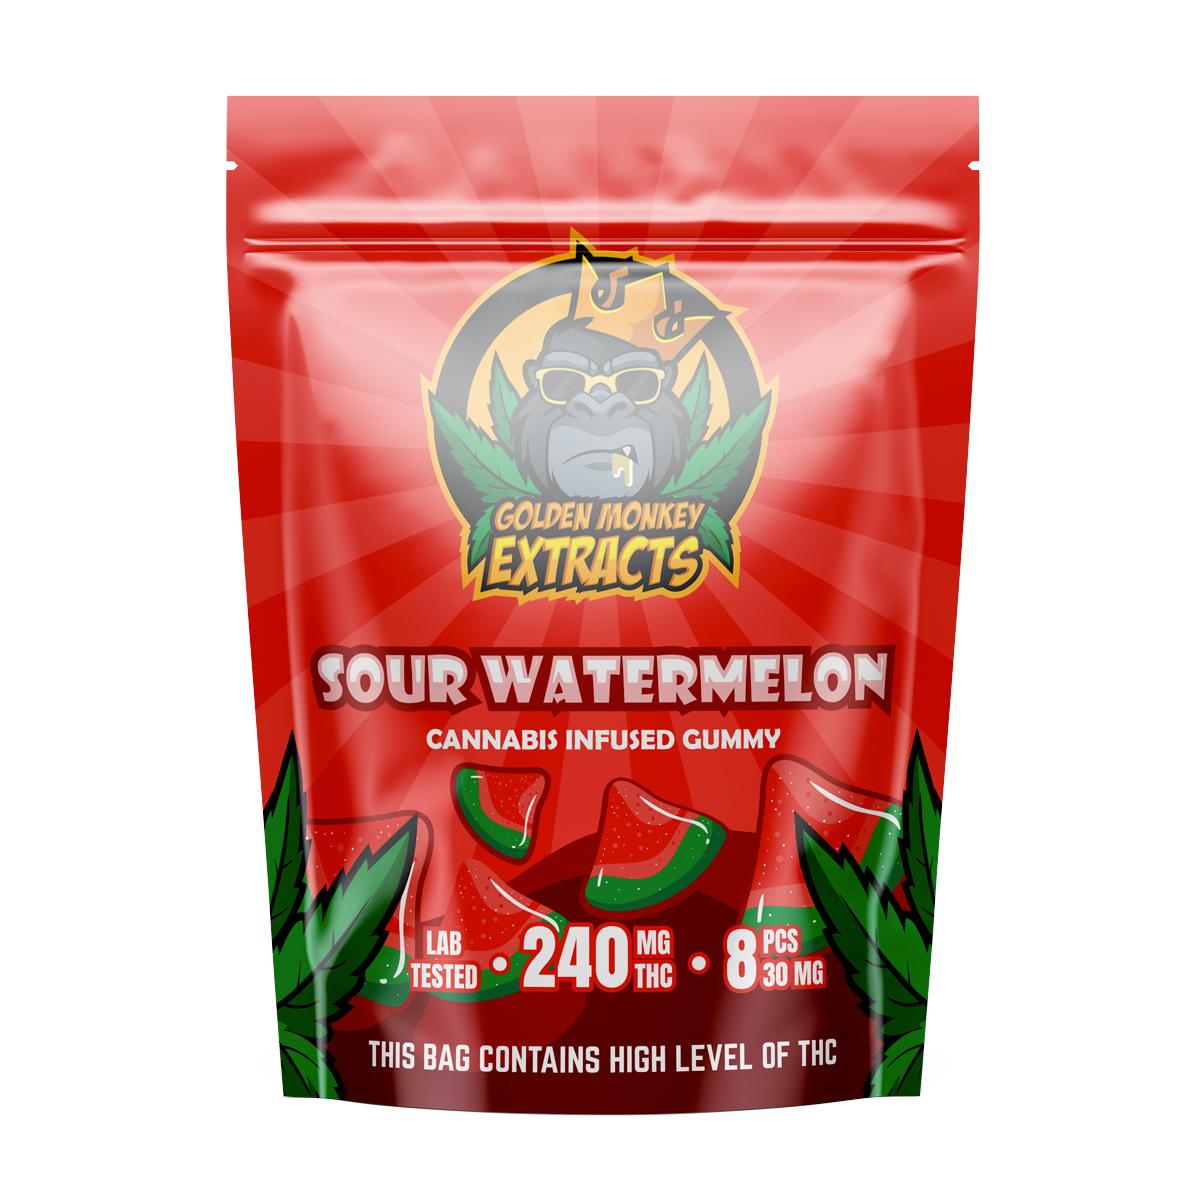 Buy Golden Monkey Sour Watermelon - 240mg THC Online